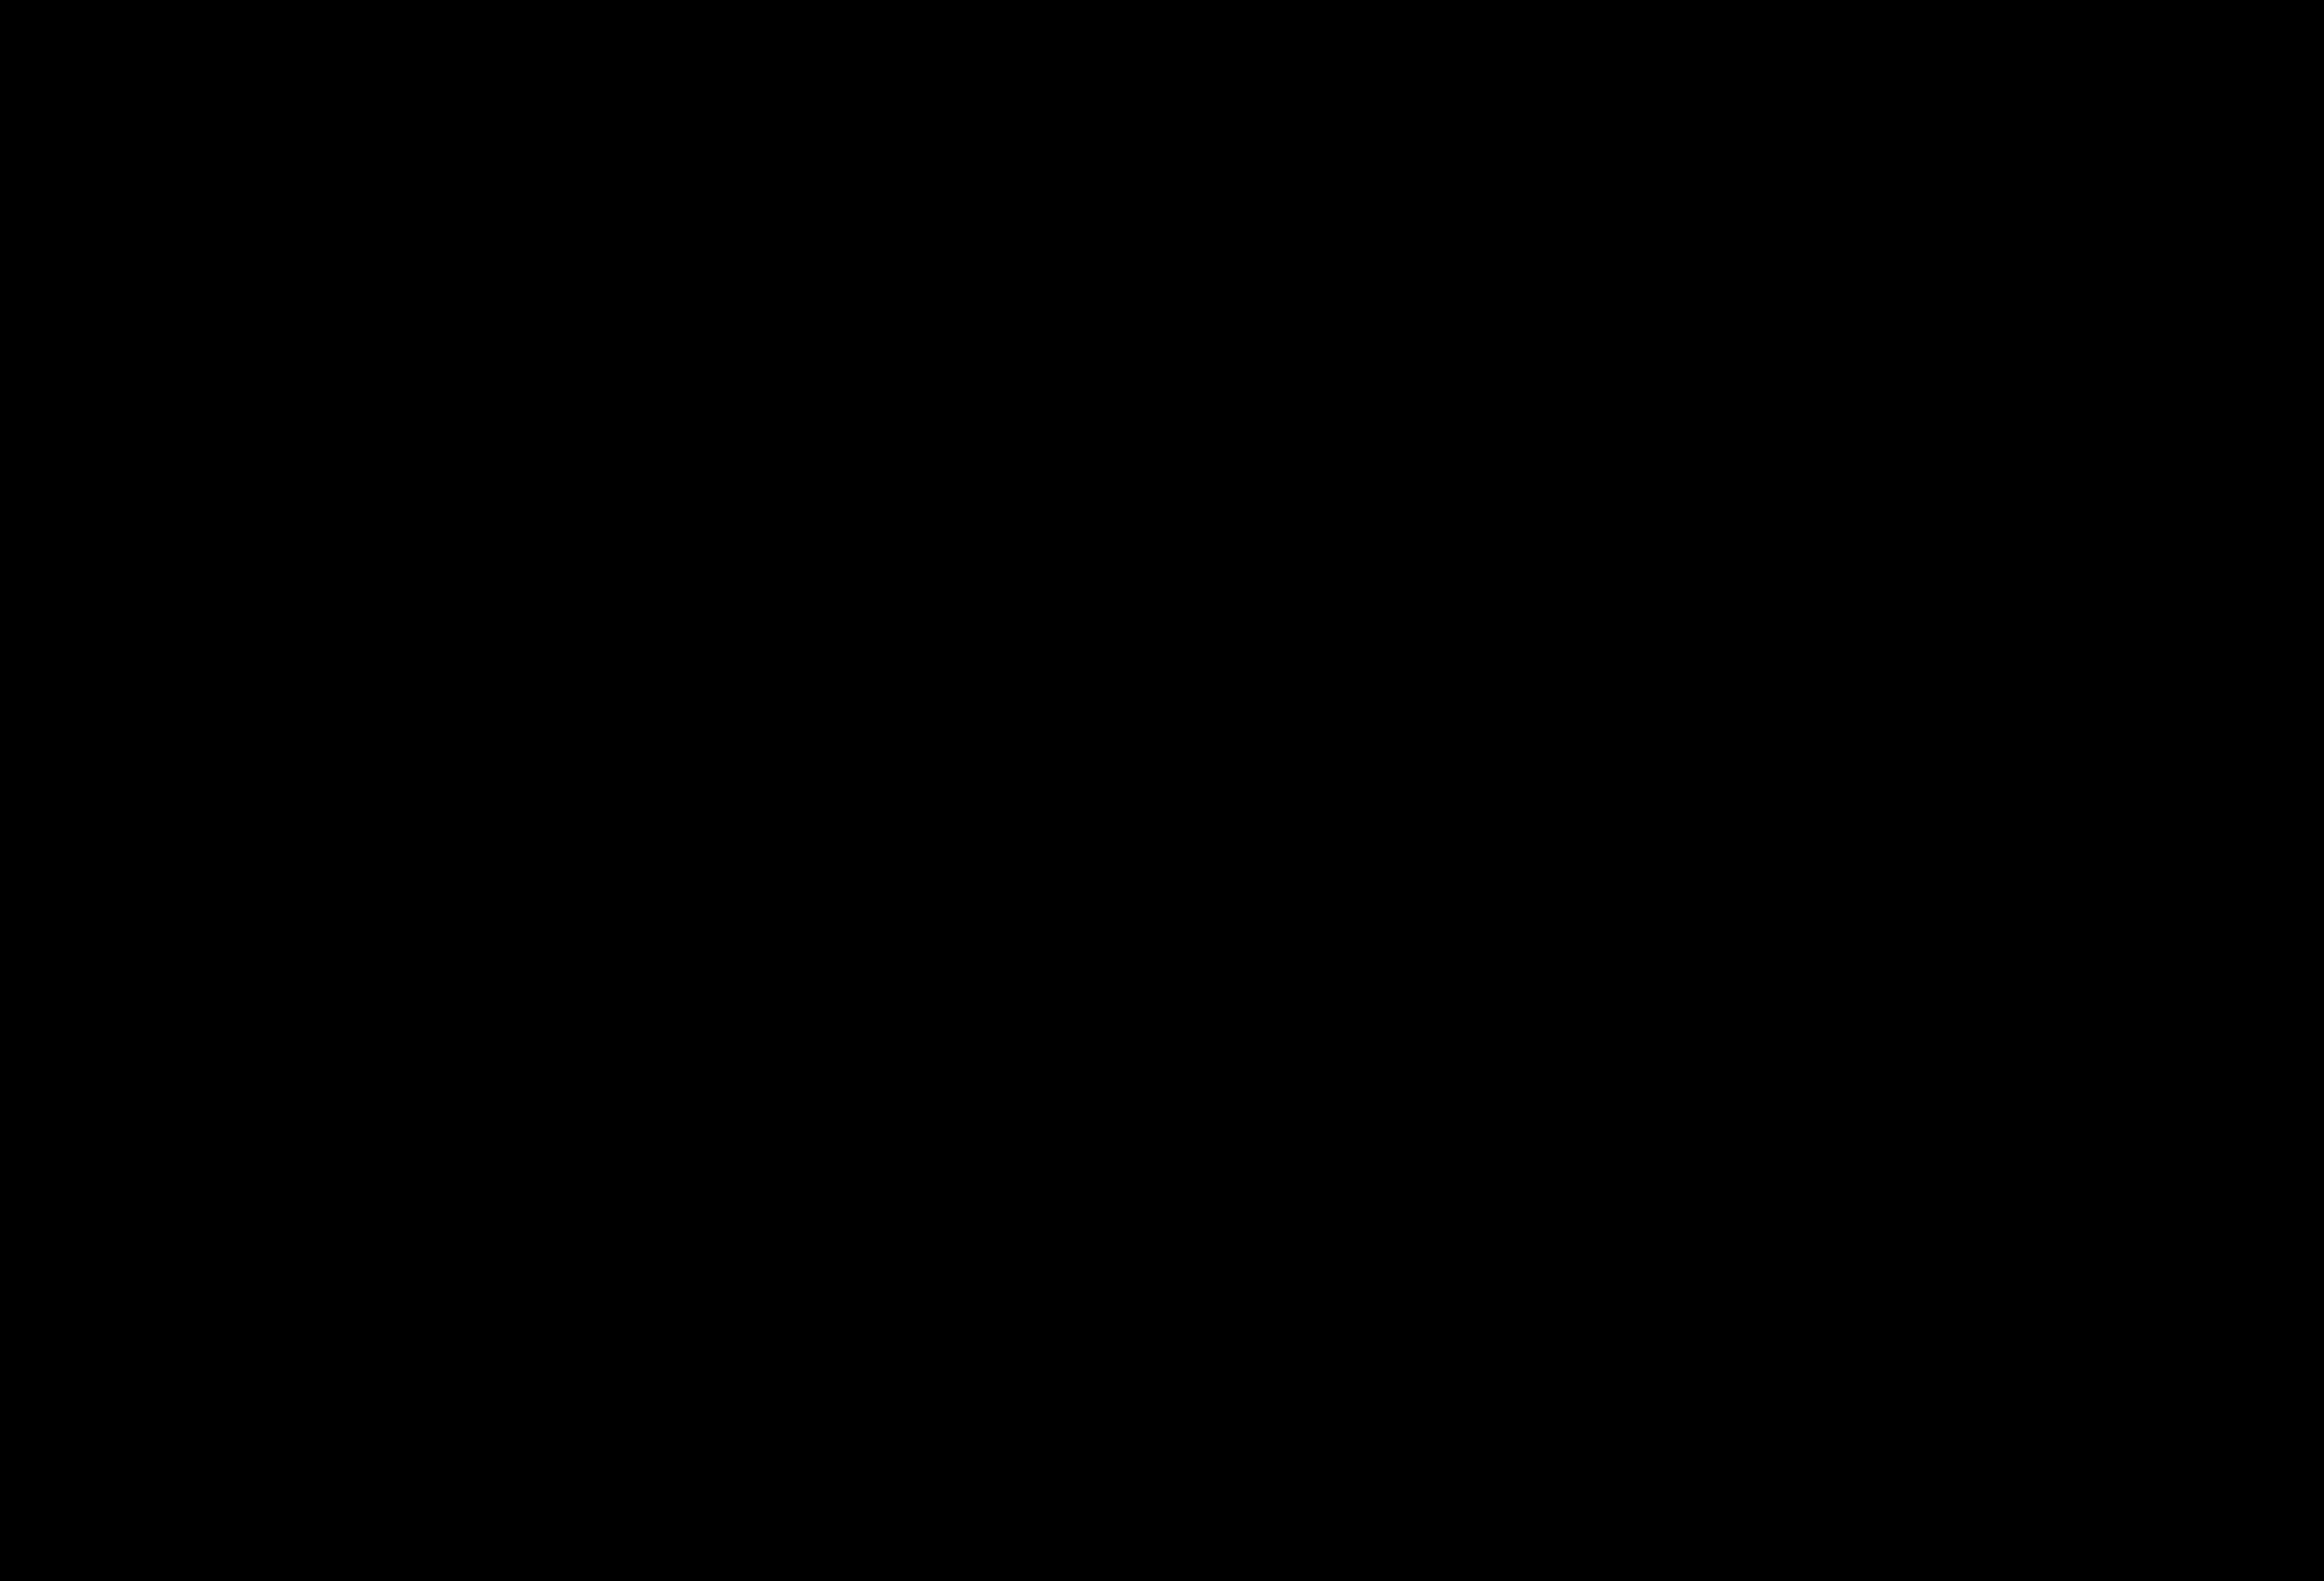 ouaotravite